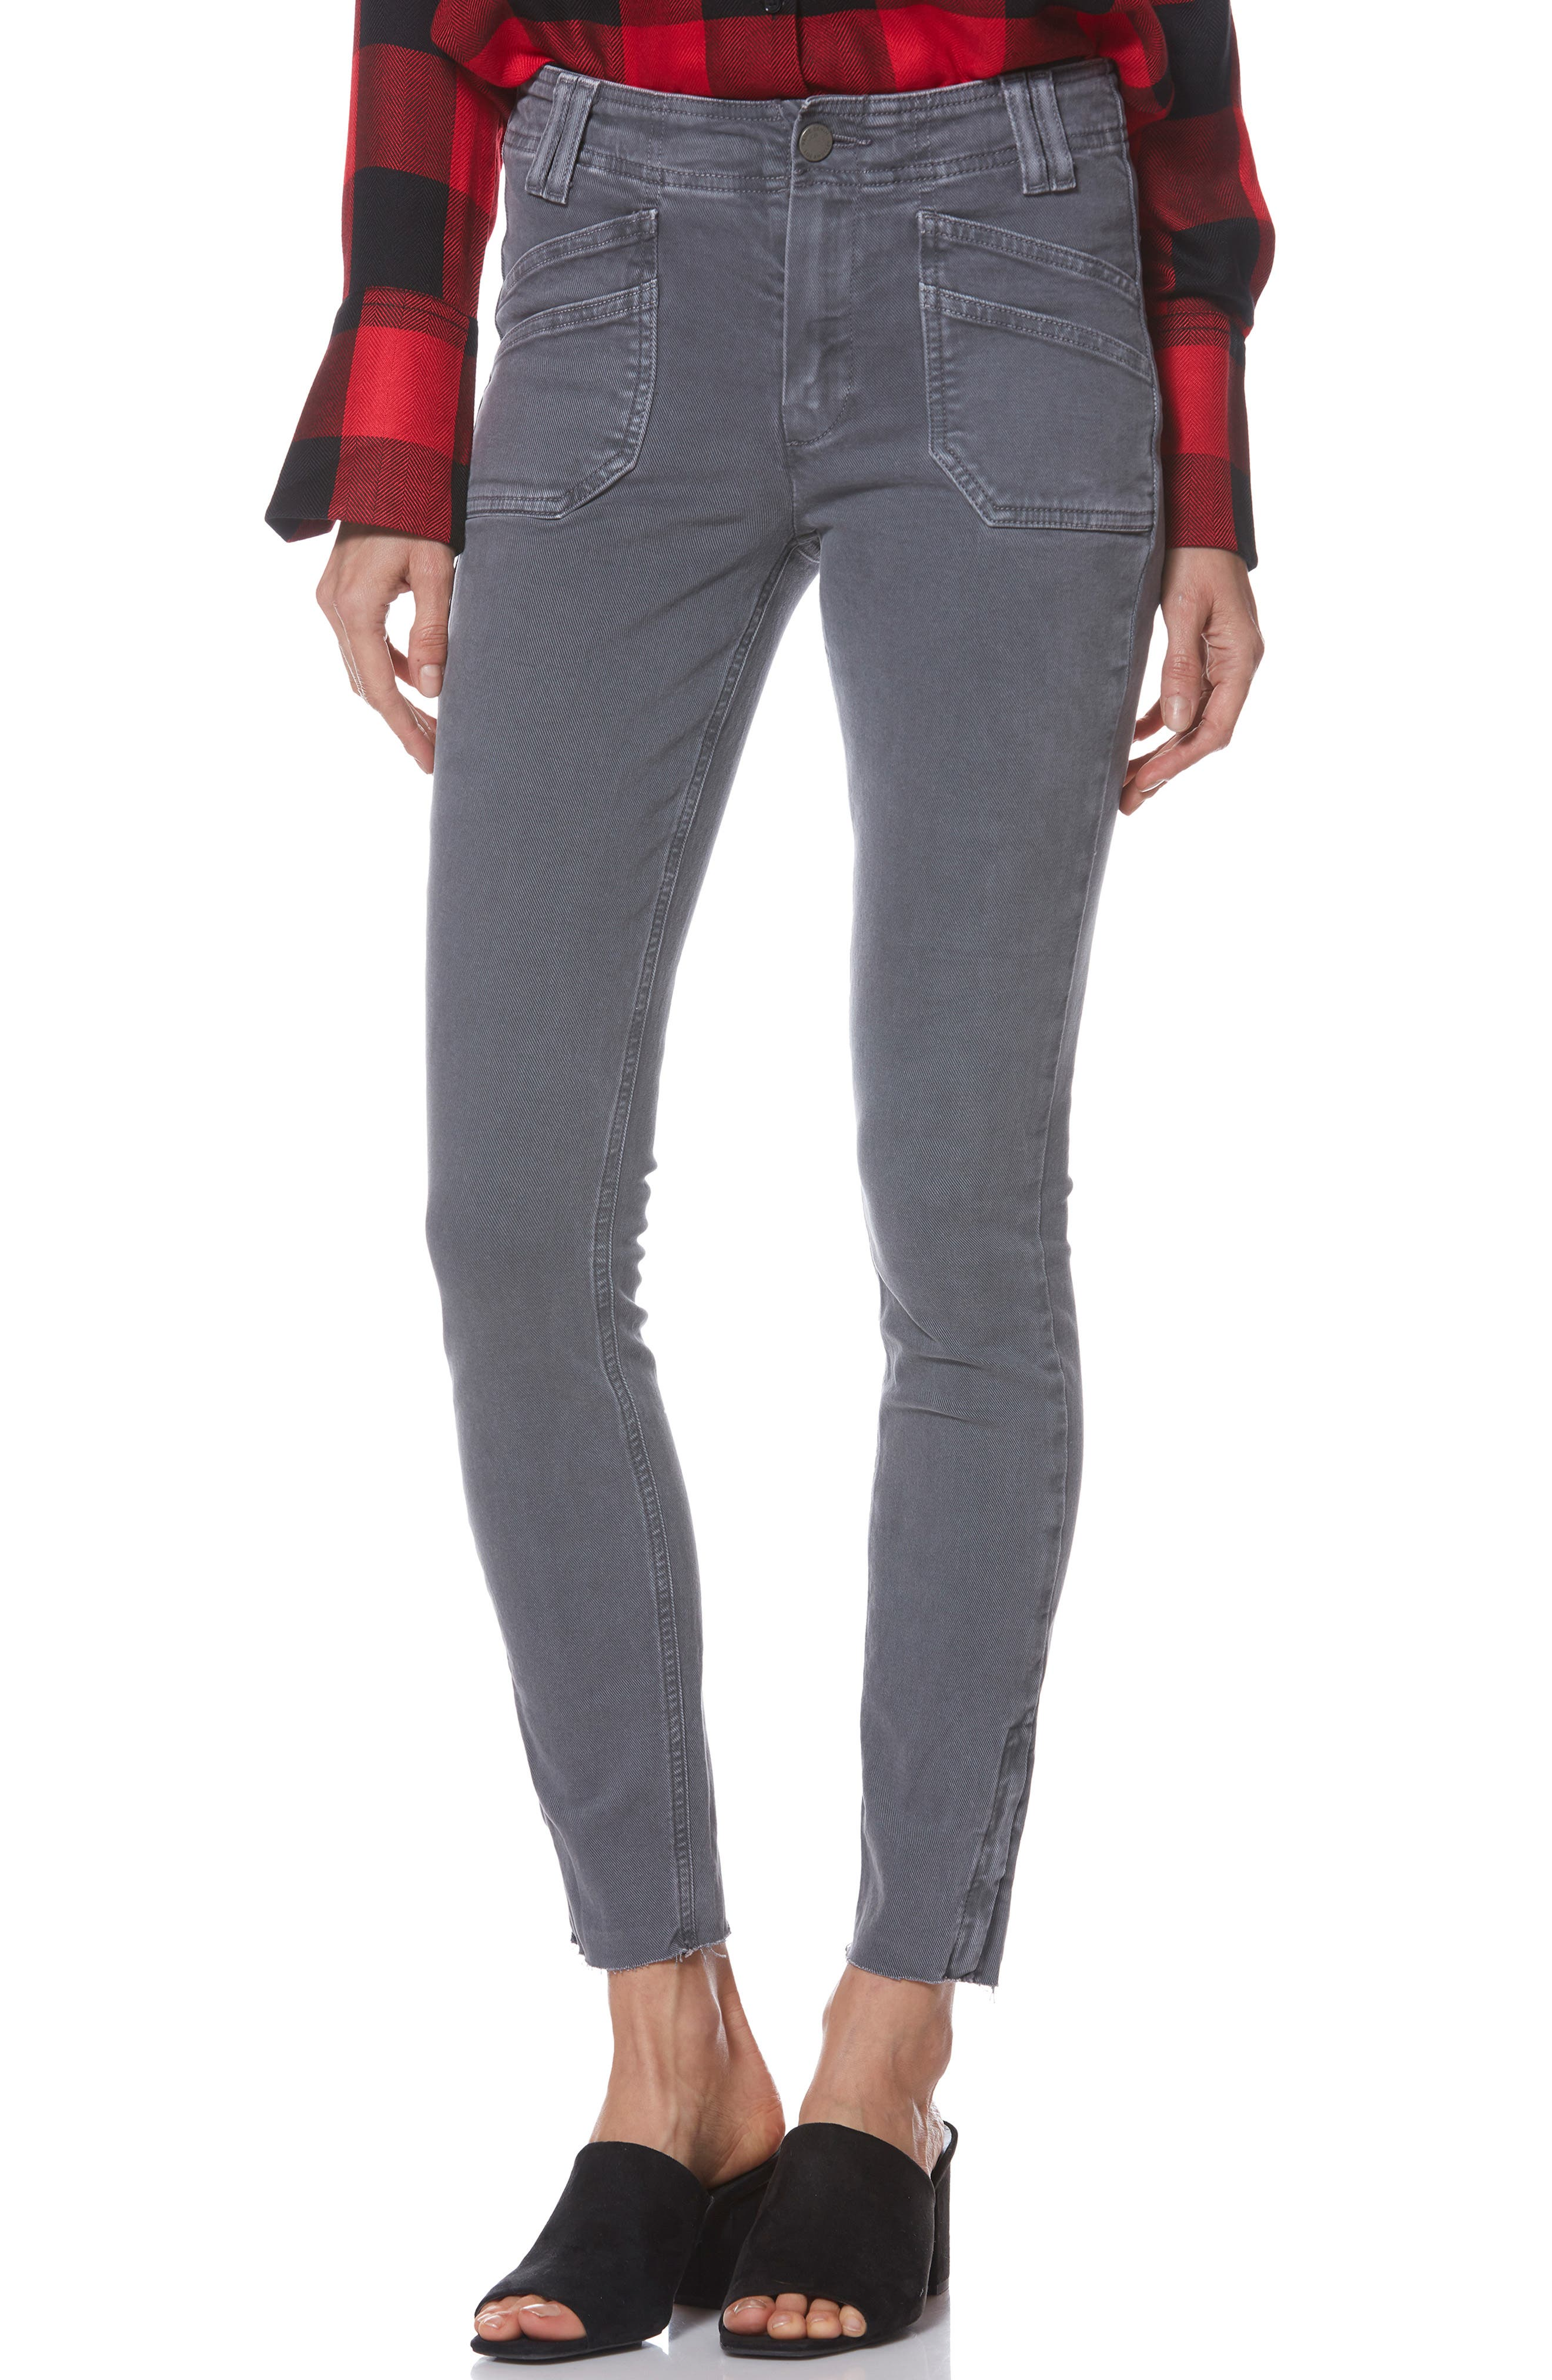 Hoxton Utilitarian High Waist Ankle Skinny Jeans,                             Main thumbnail 1, color,                             VINTAGE TORNADO